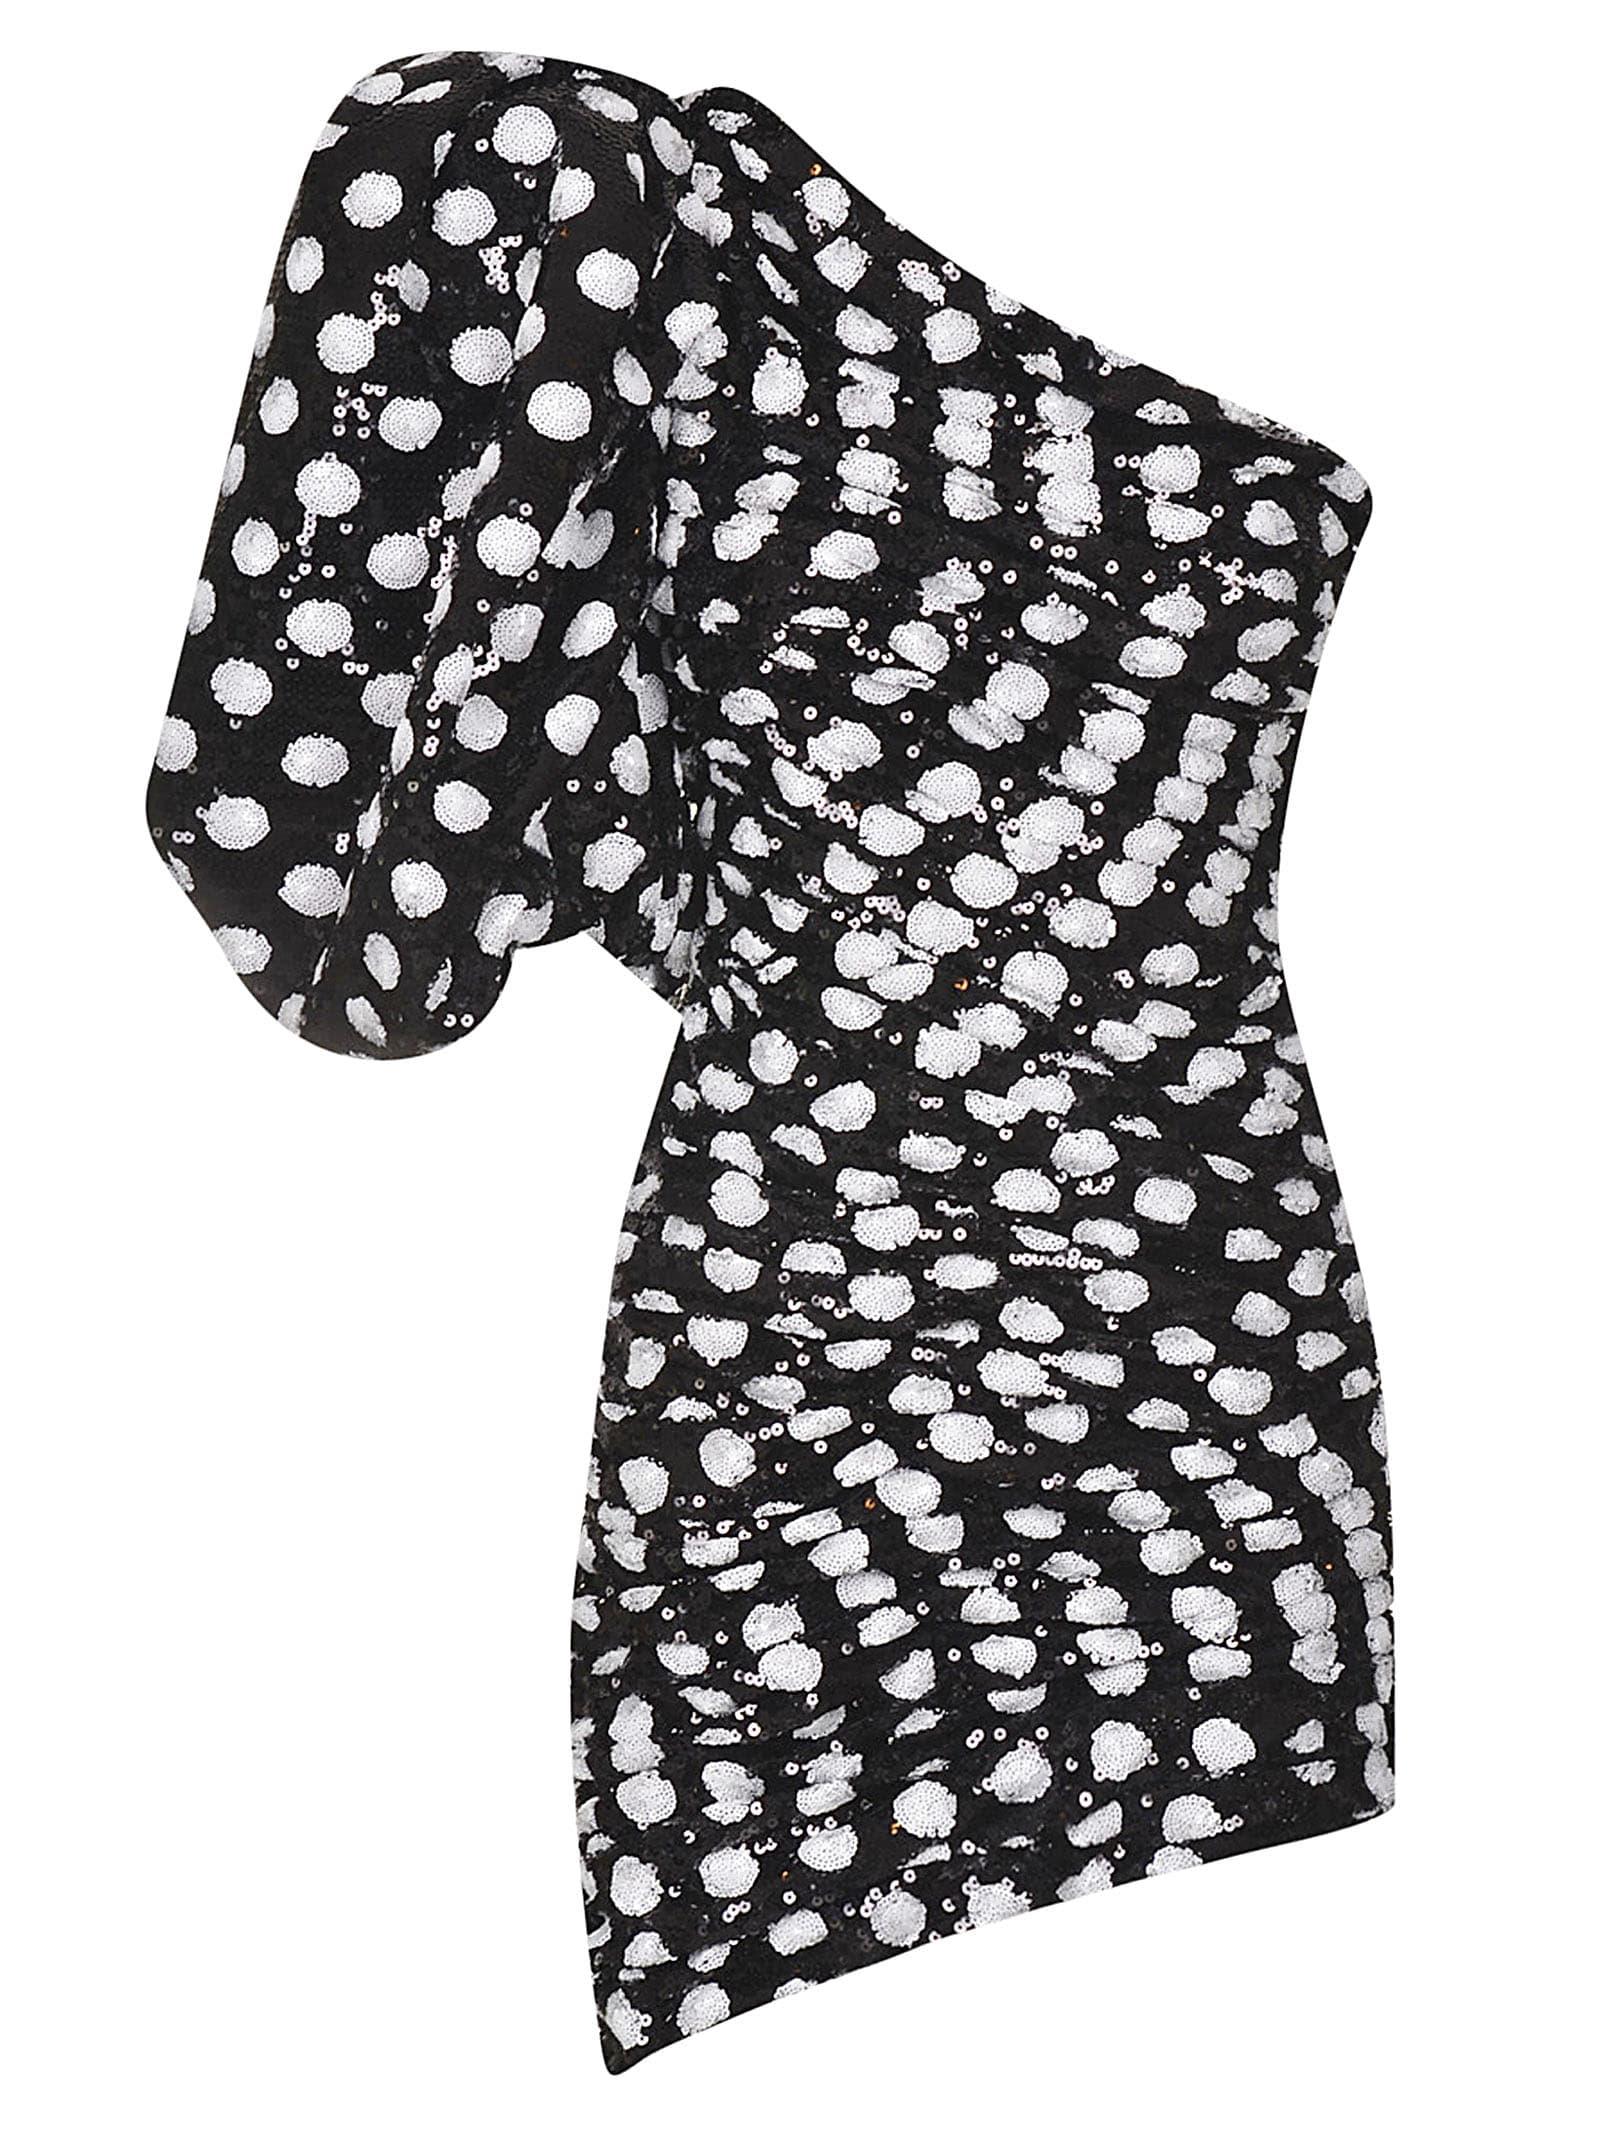 Buy Giuseppe di Morabito One-shoulder Polka-dot Dress online, shop Giuseppe di Morabito with free shipping